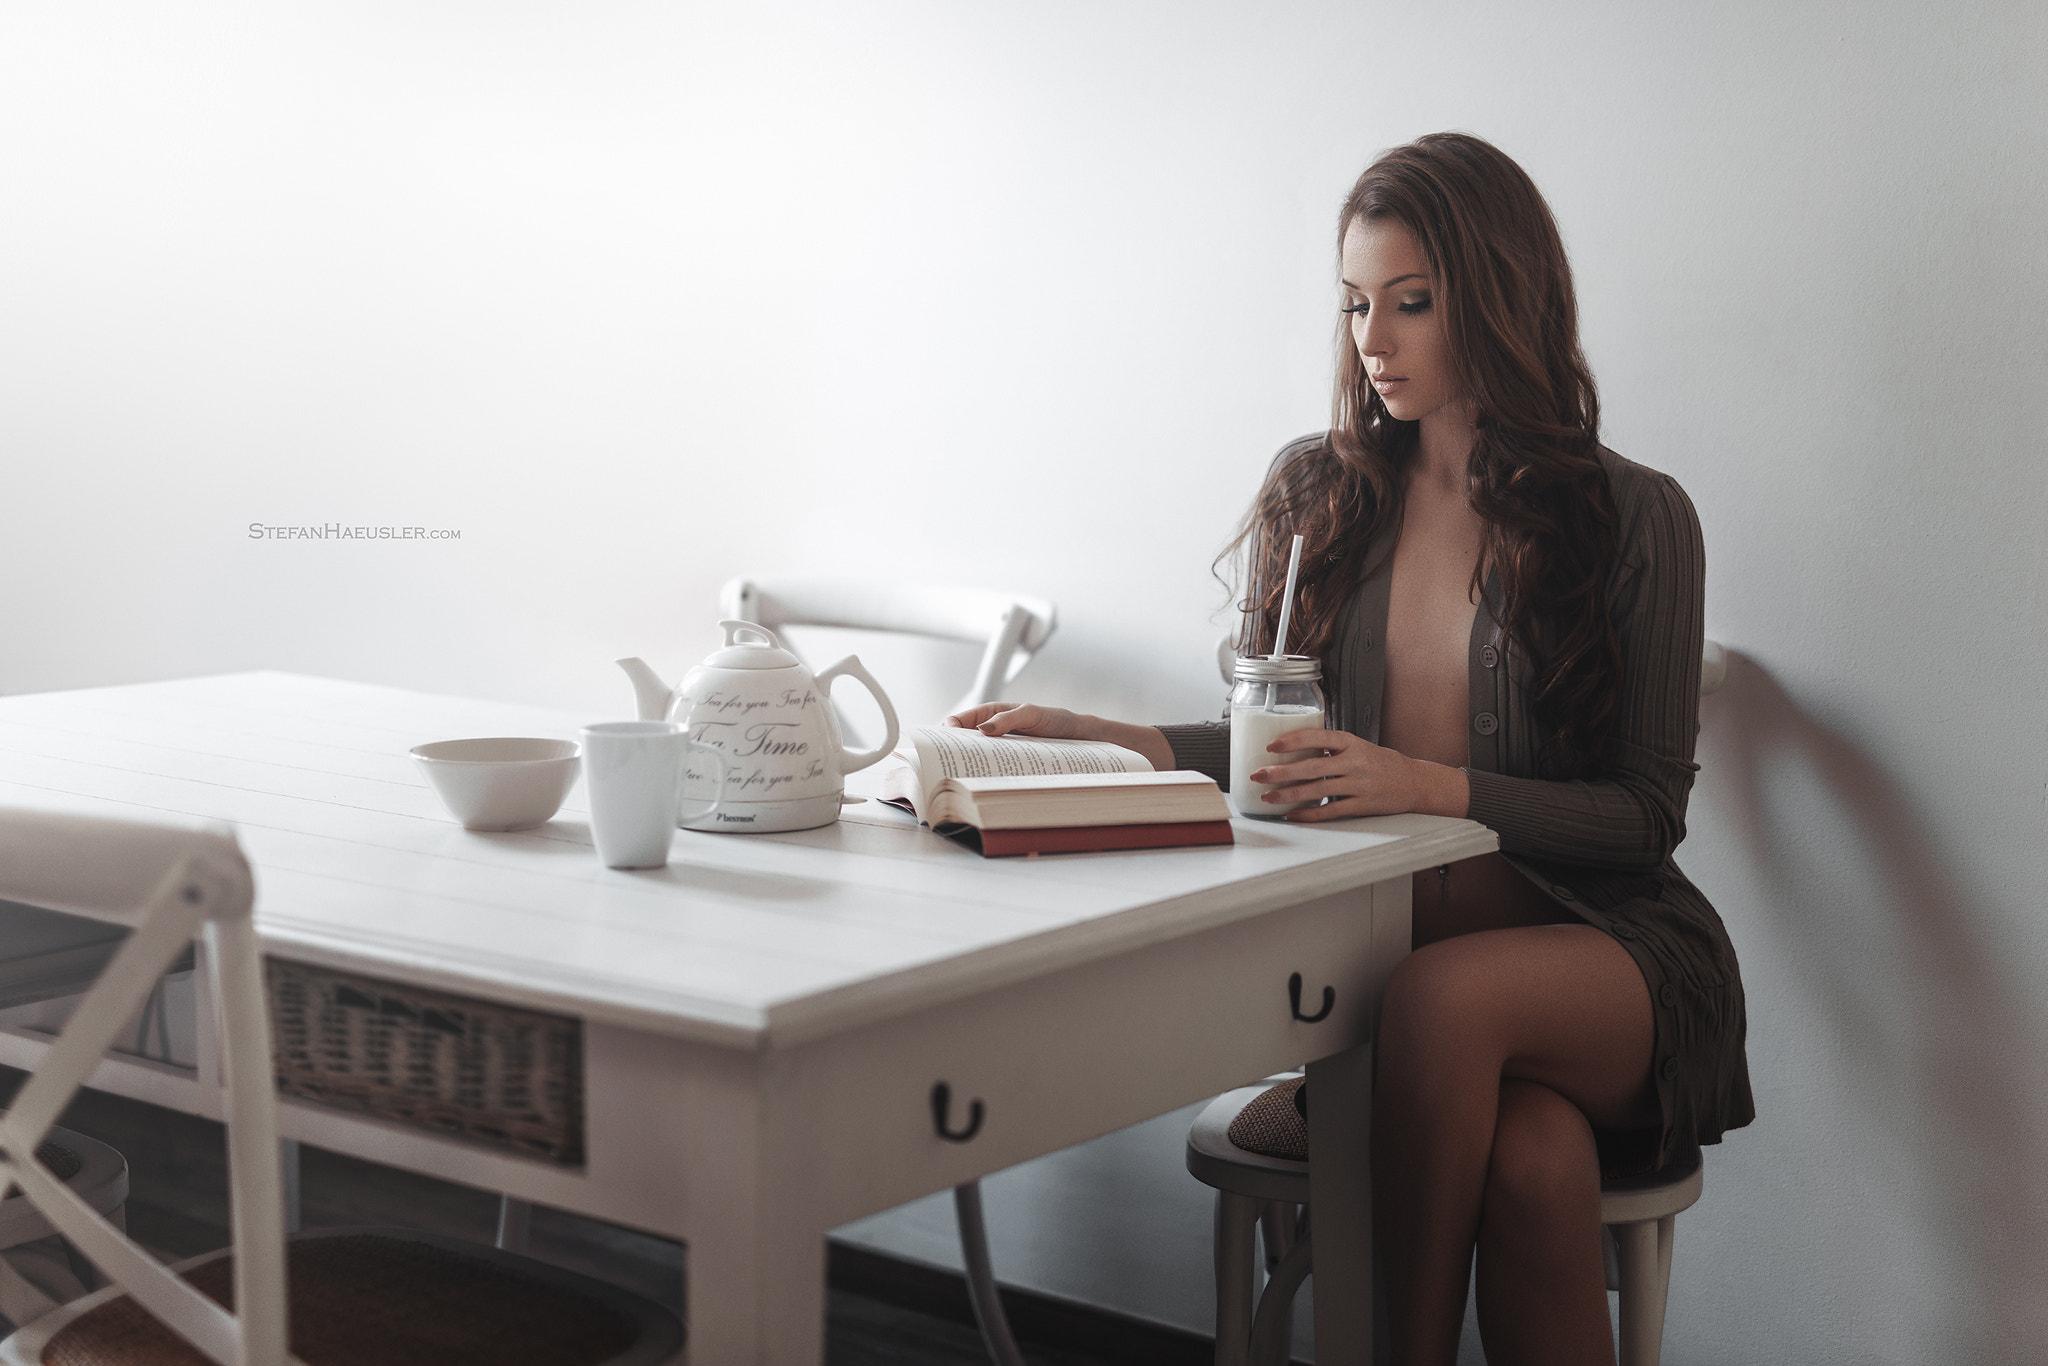 People 2048x1366 Viktoria Stephanie Stefan Häusler women sitting milk legs crossed women indoors books cup chair table brunette open sweater Viktoria Kummer